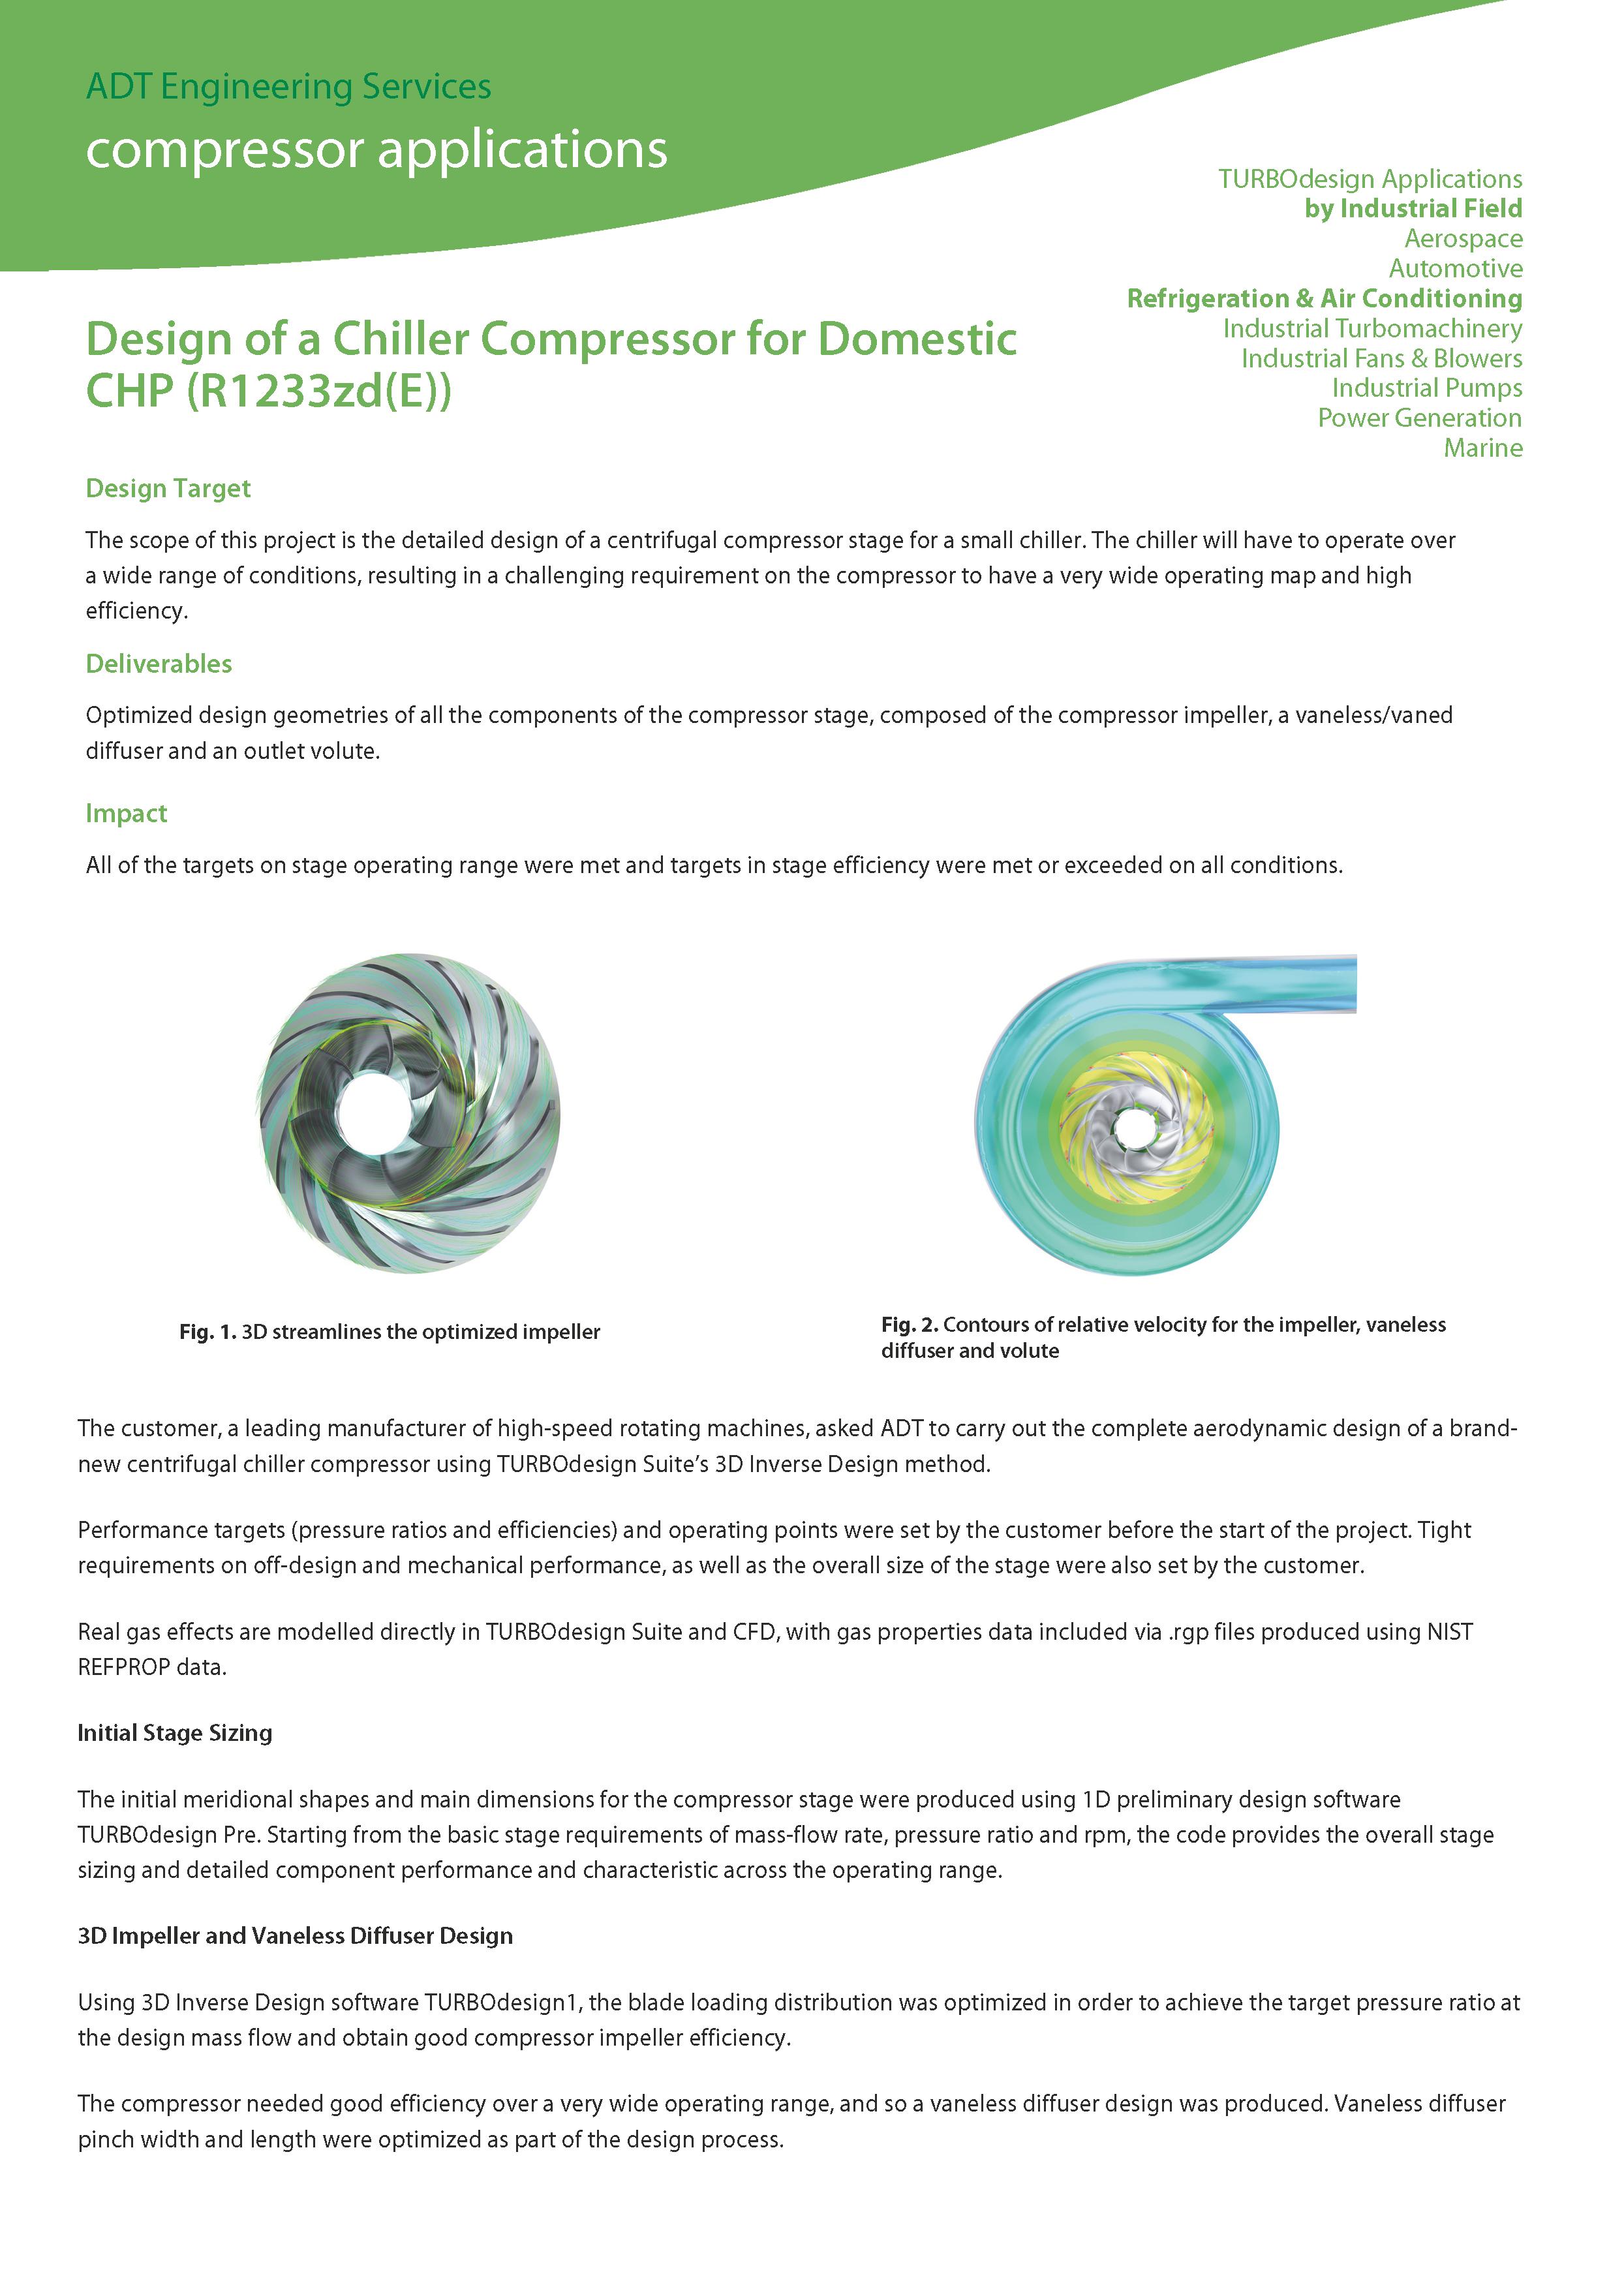 Chiller compressor front page PDF